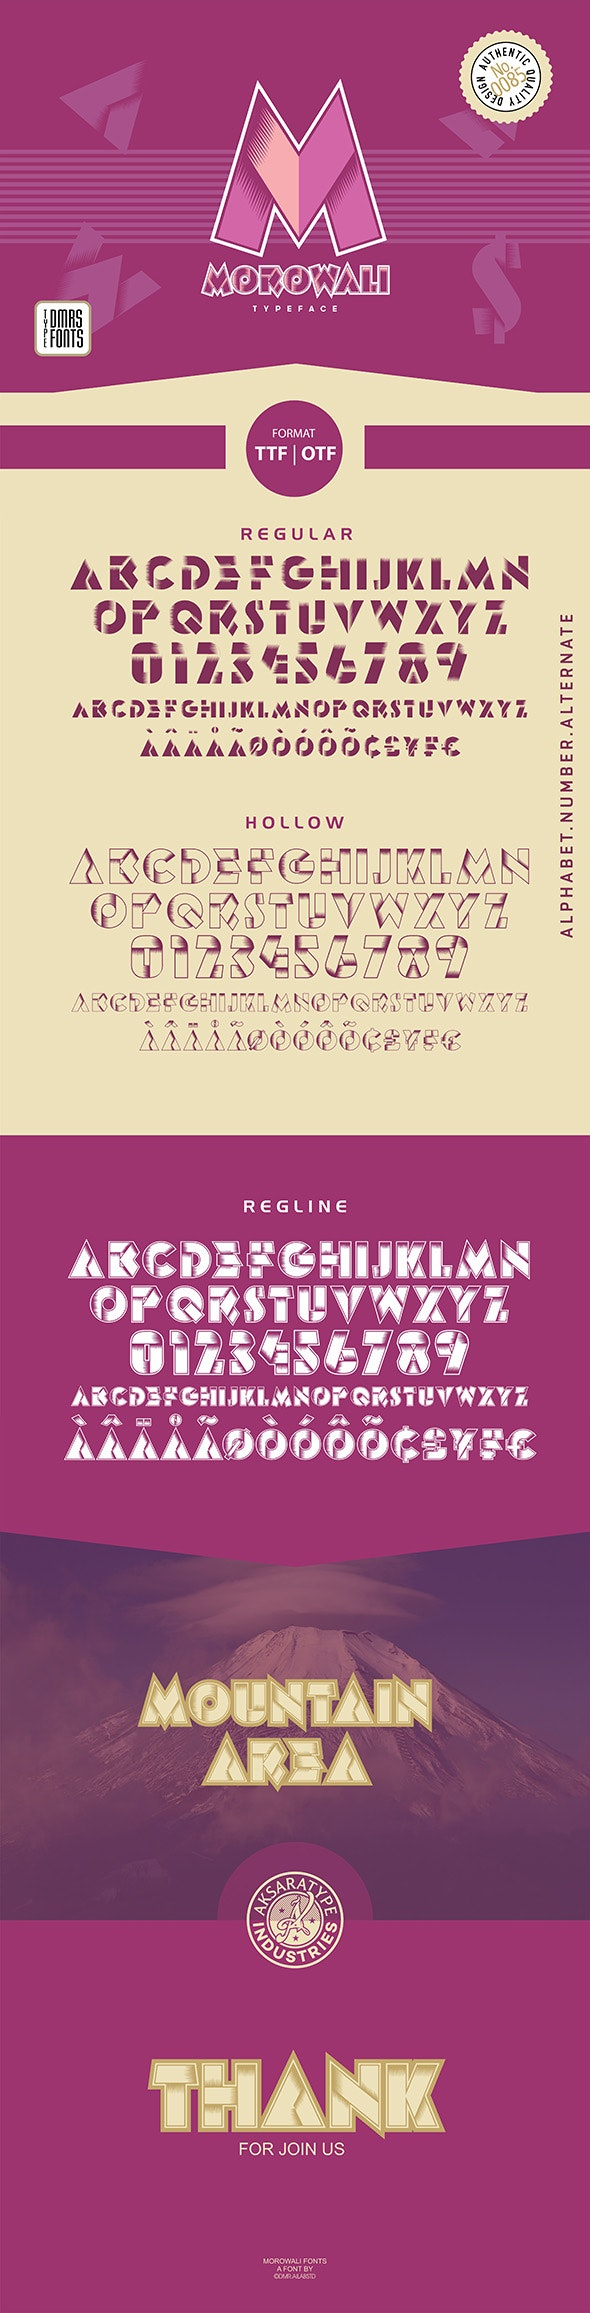 Morowali Font - Decorative Fonts